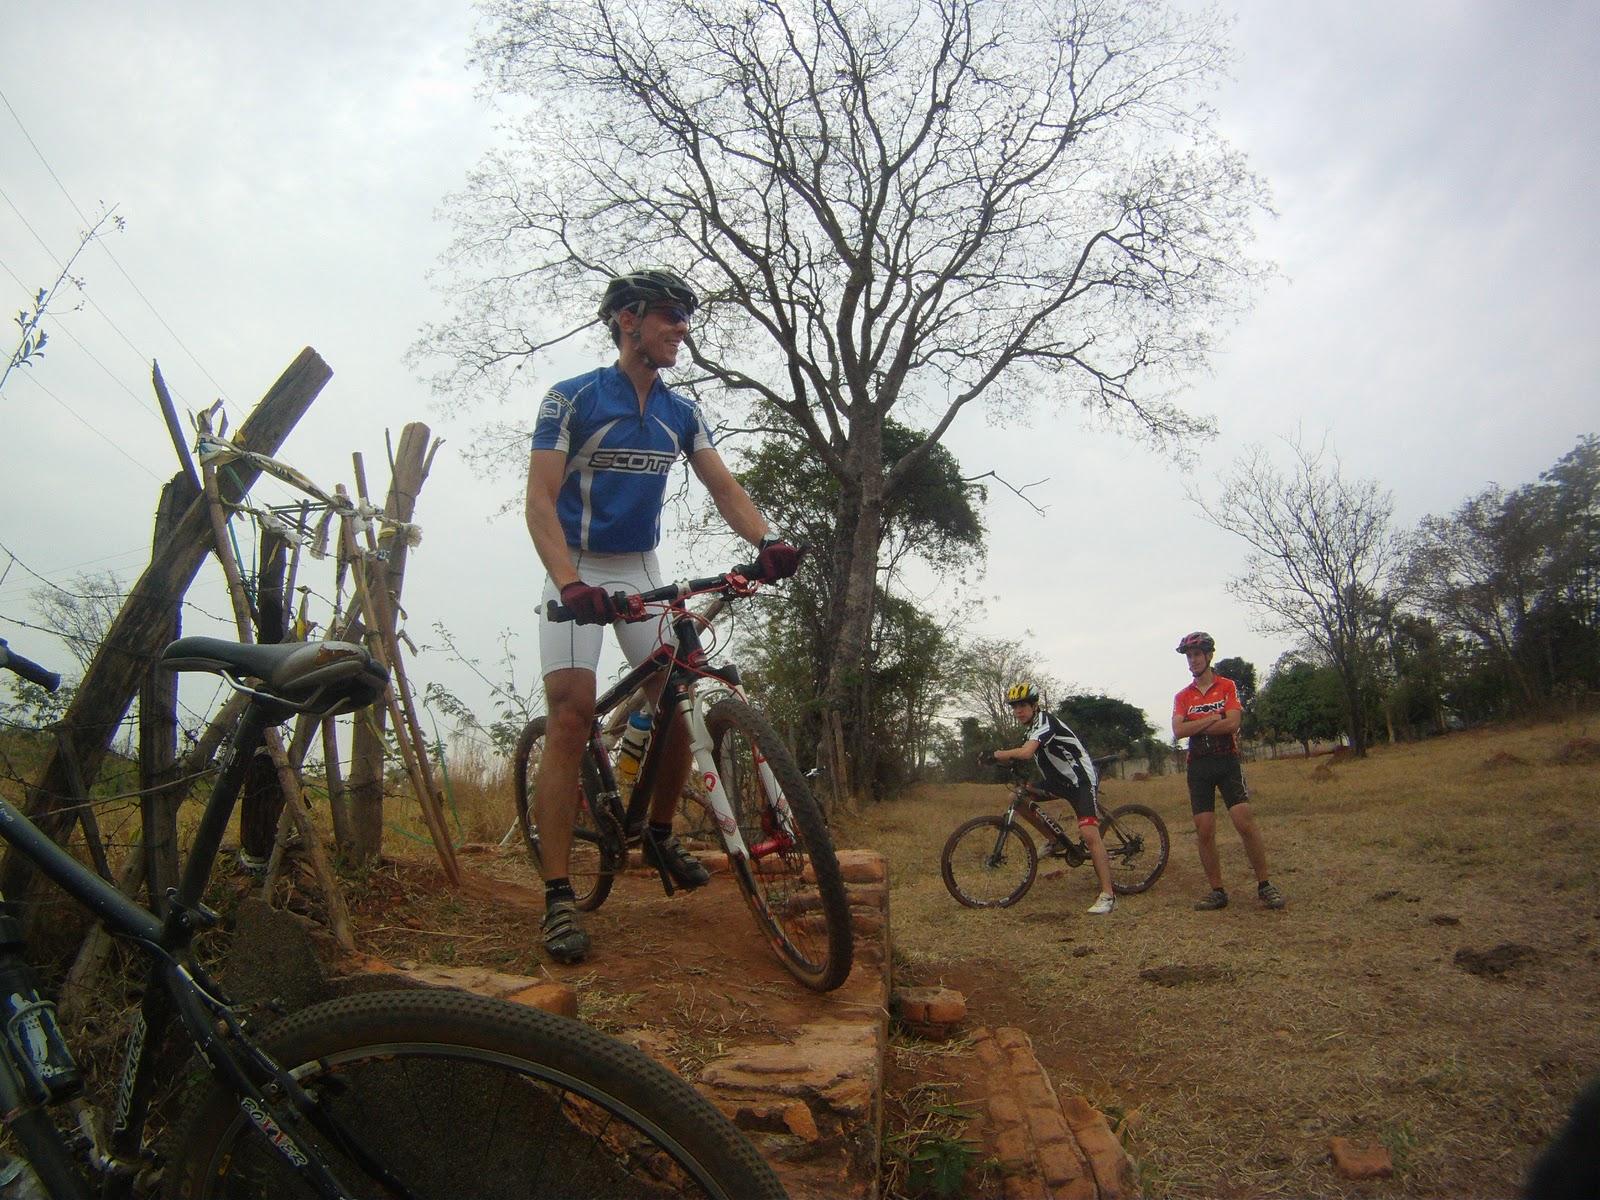 Circuito Xco : Passos mountain bike circuito xco mtb